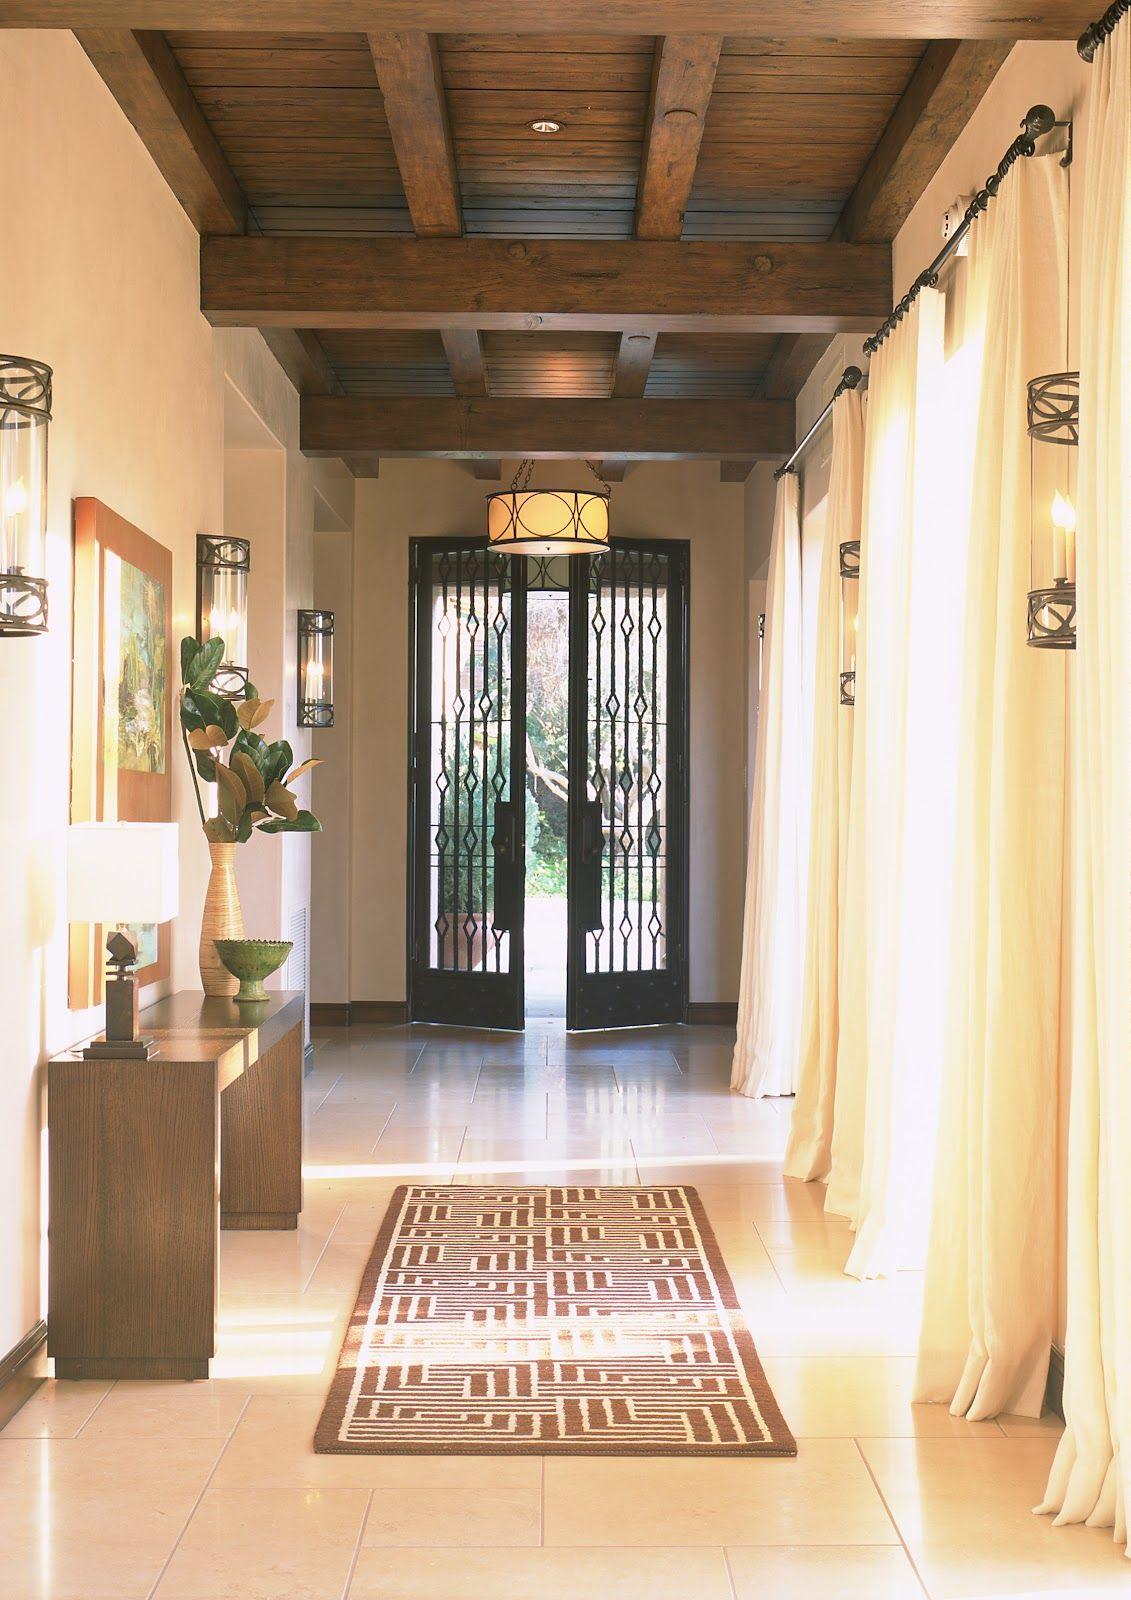 Entry hall in  home by mark cutler design also decor ideas pinterest rh